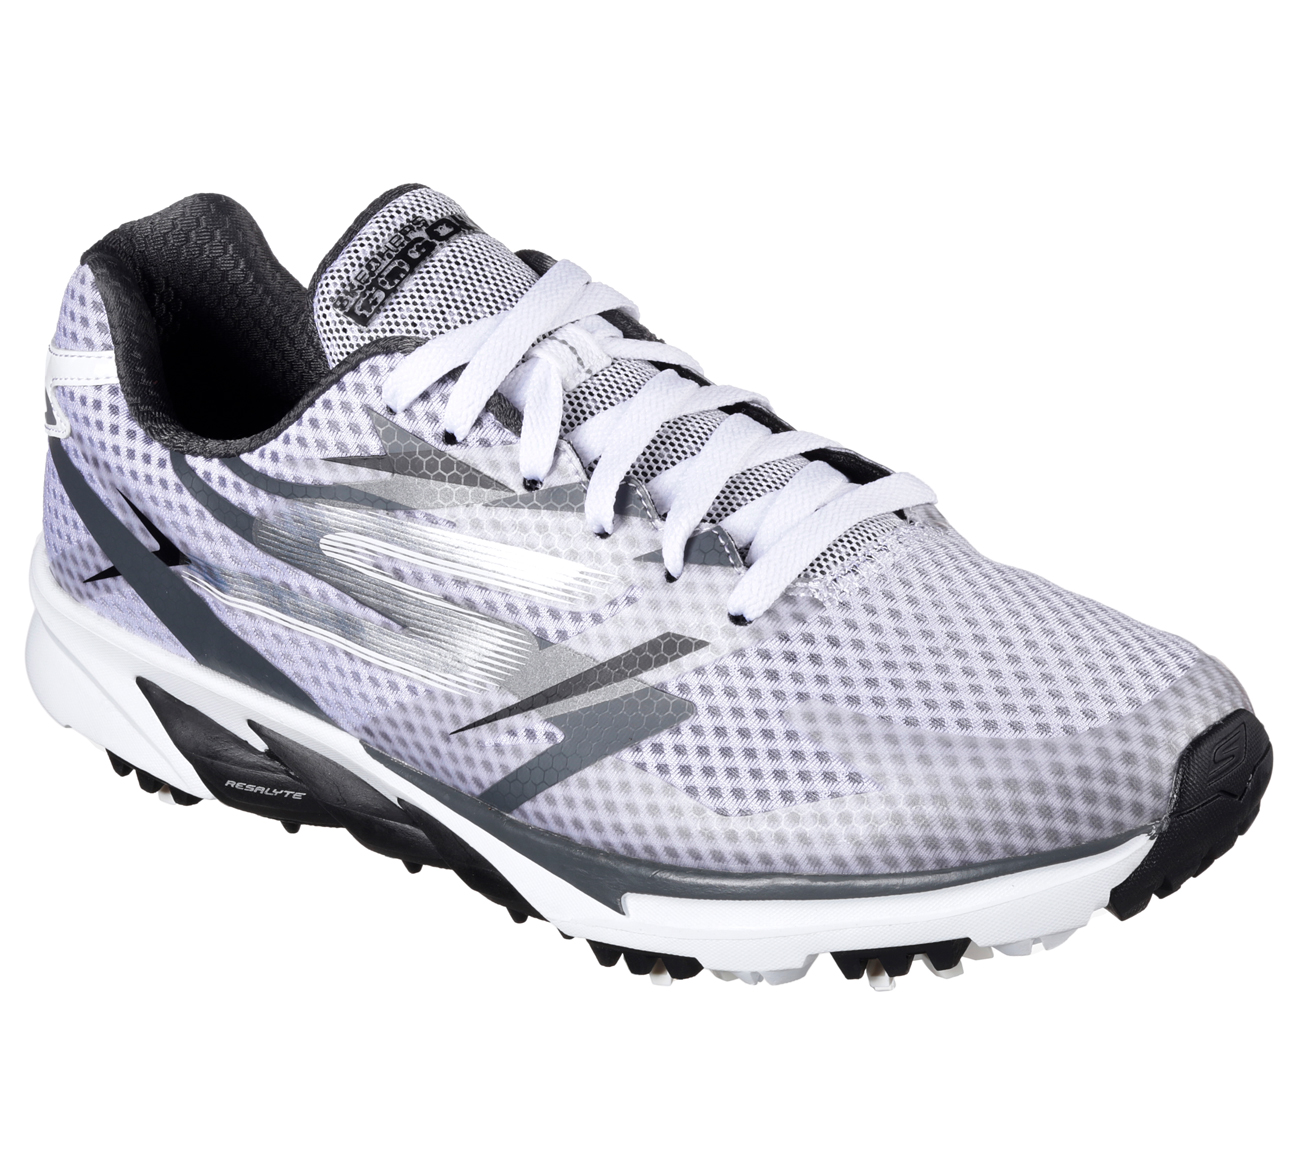 Sketchers Men's Go Golf Blade Power Golf Shoe - White/Grey